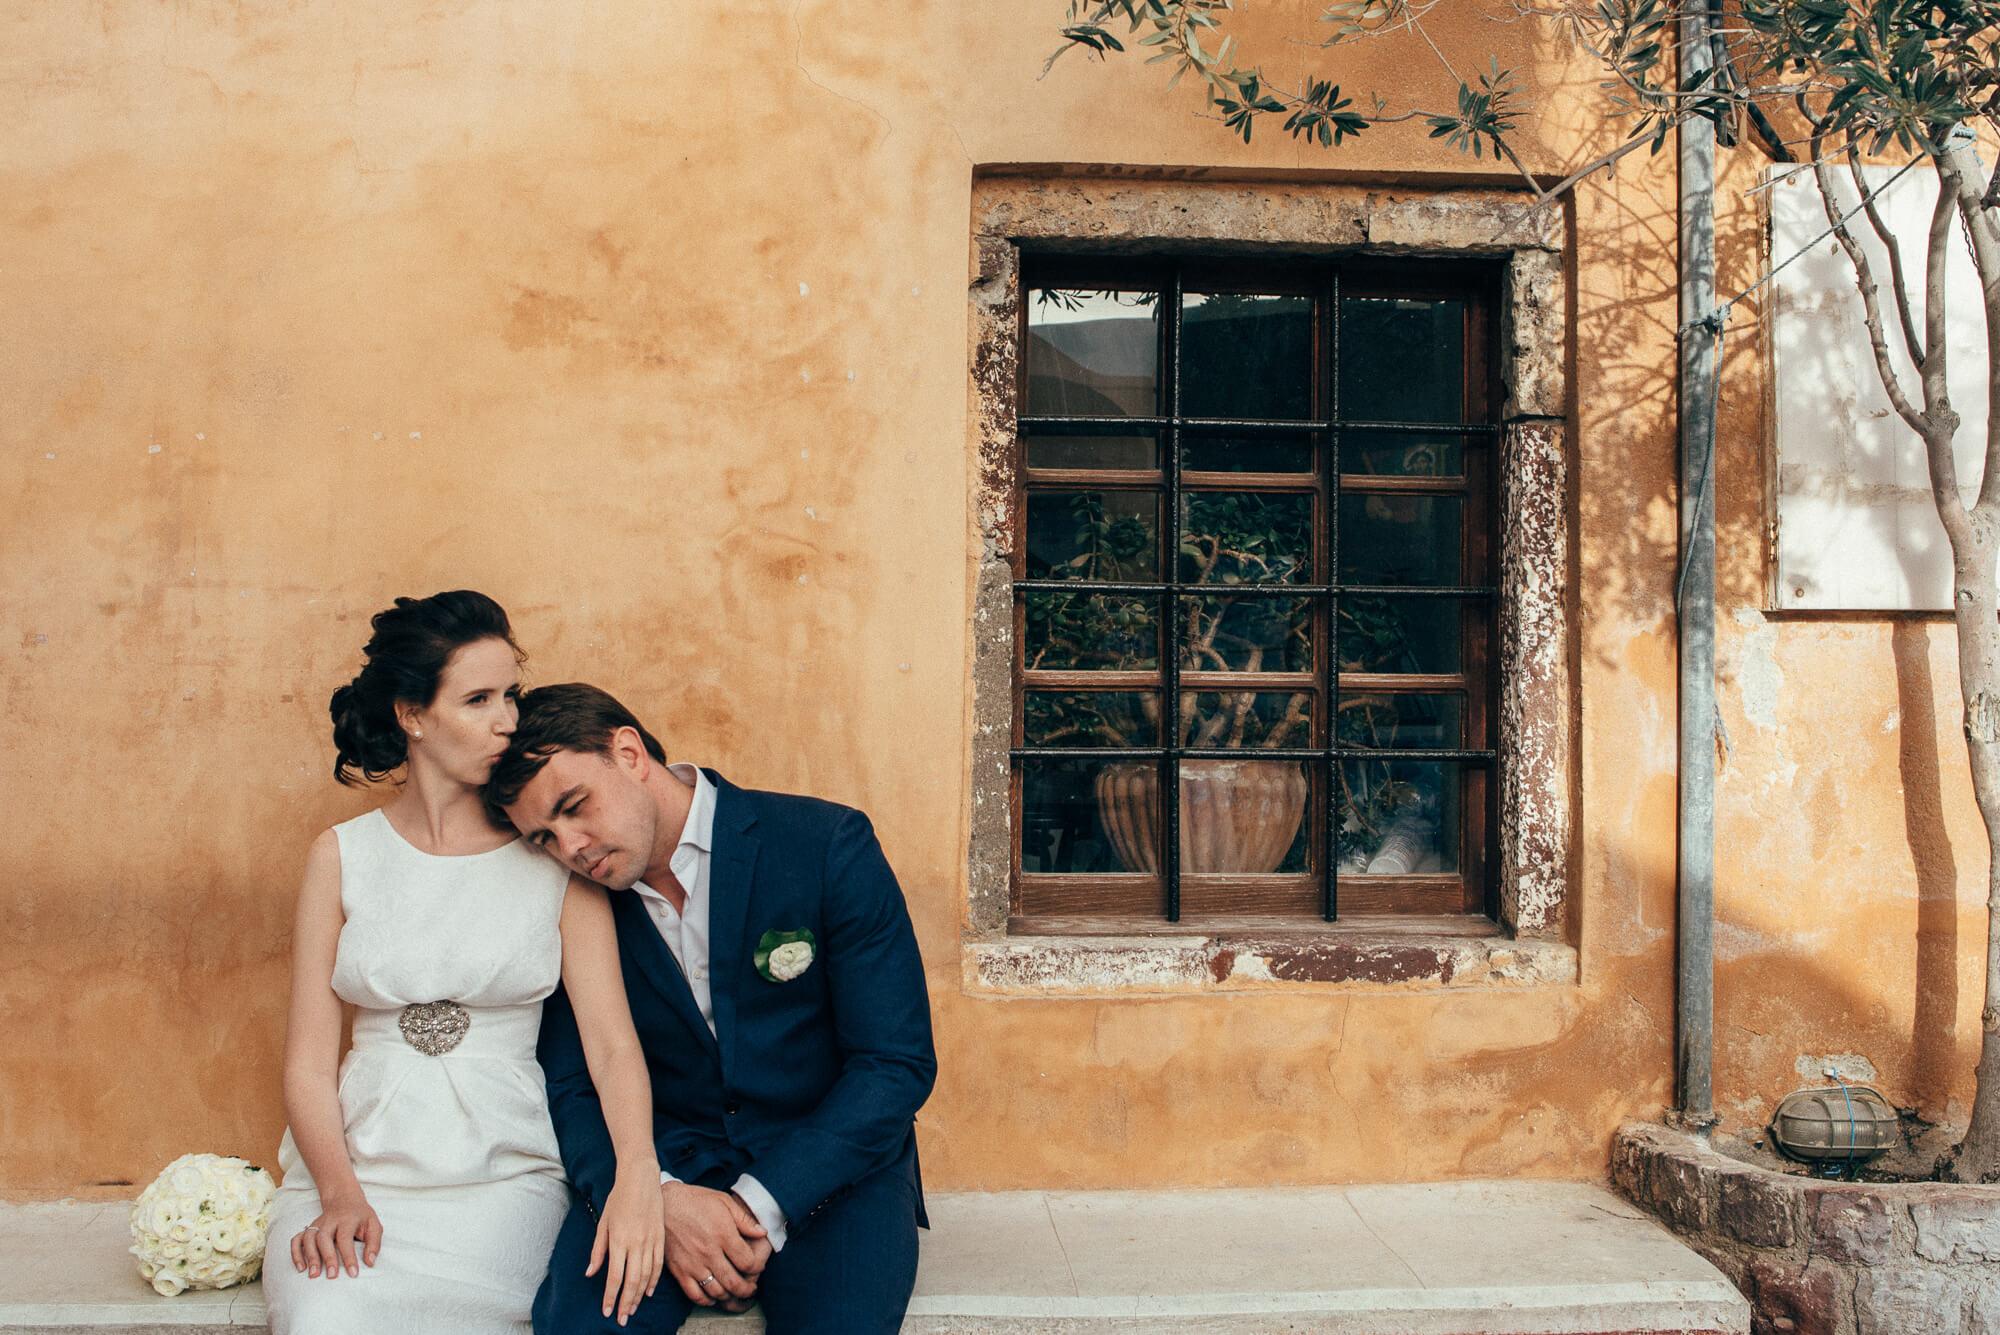 manes-wedding-photographer-greece-164